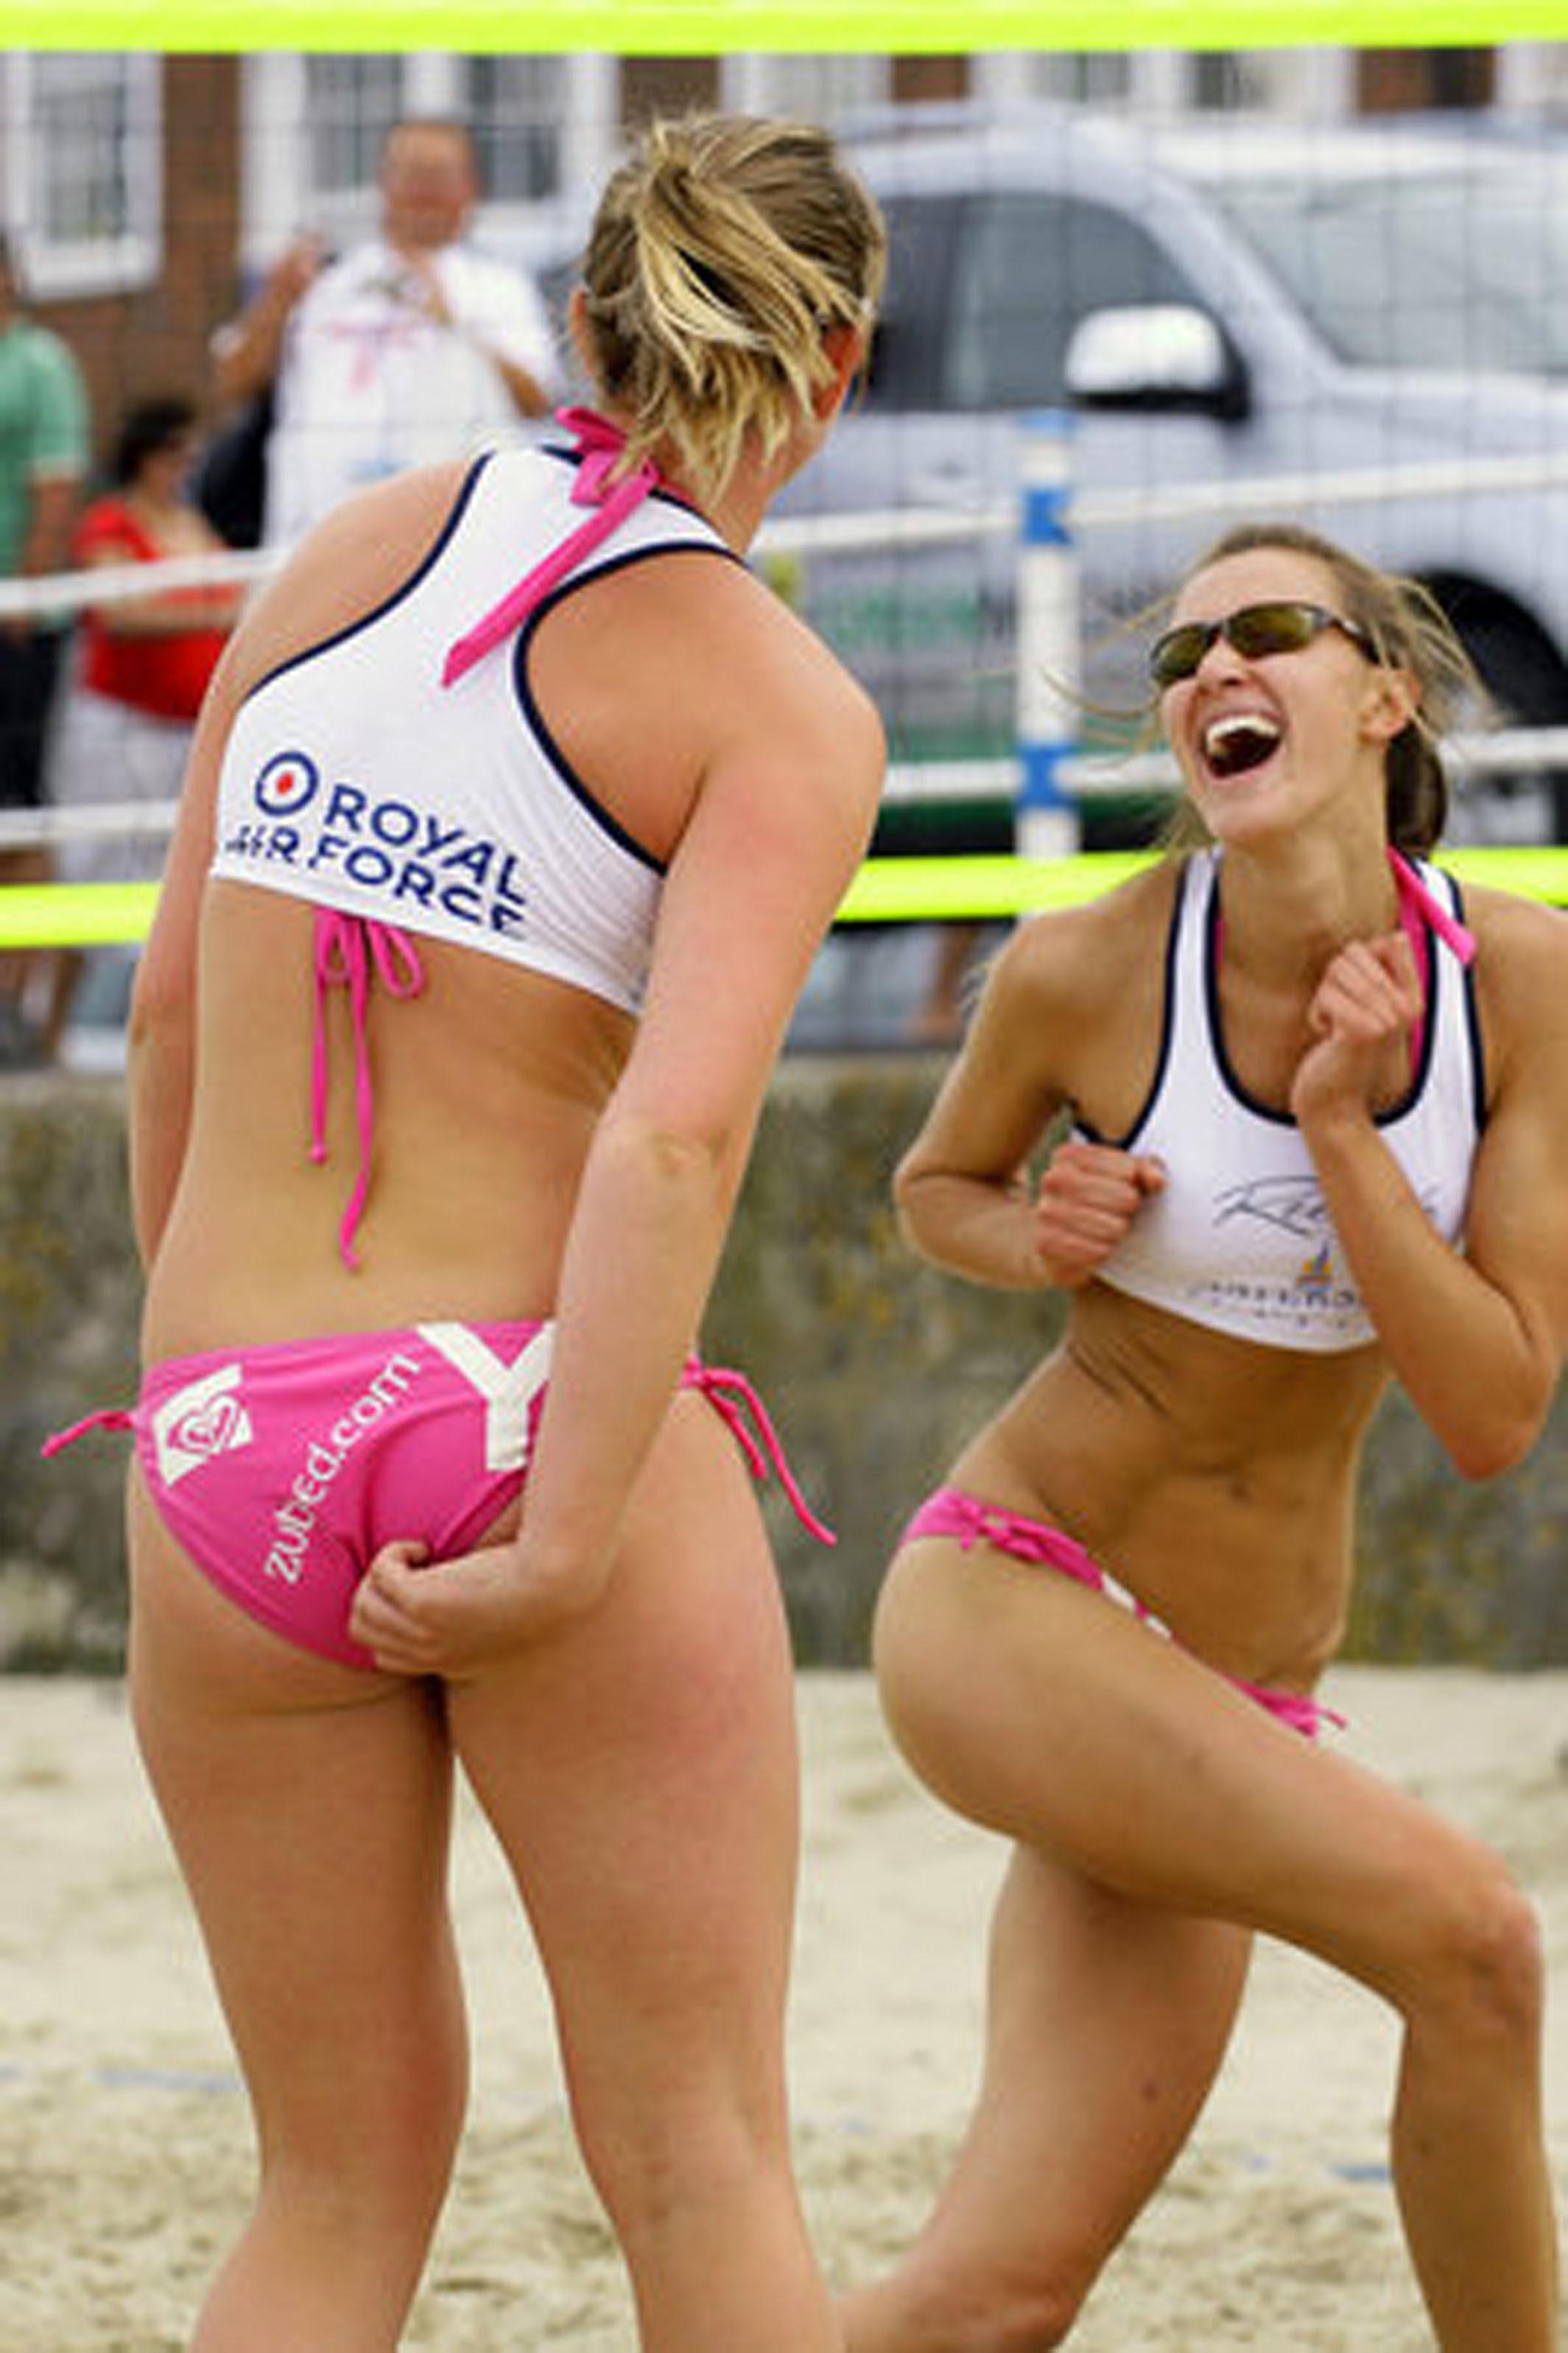 http://upload.wikimedia.org/wikipedia/commons/b/b6/Beach_Volleyball_Classic_2007_(1444265768).jpg